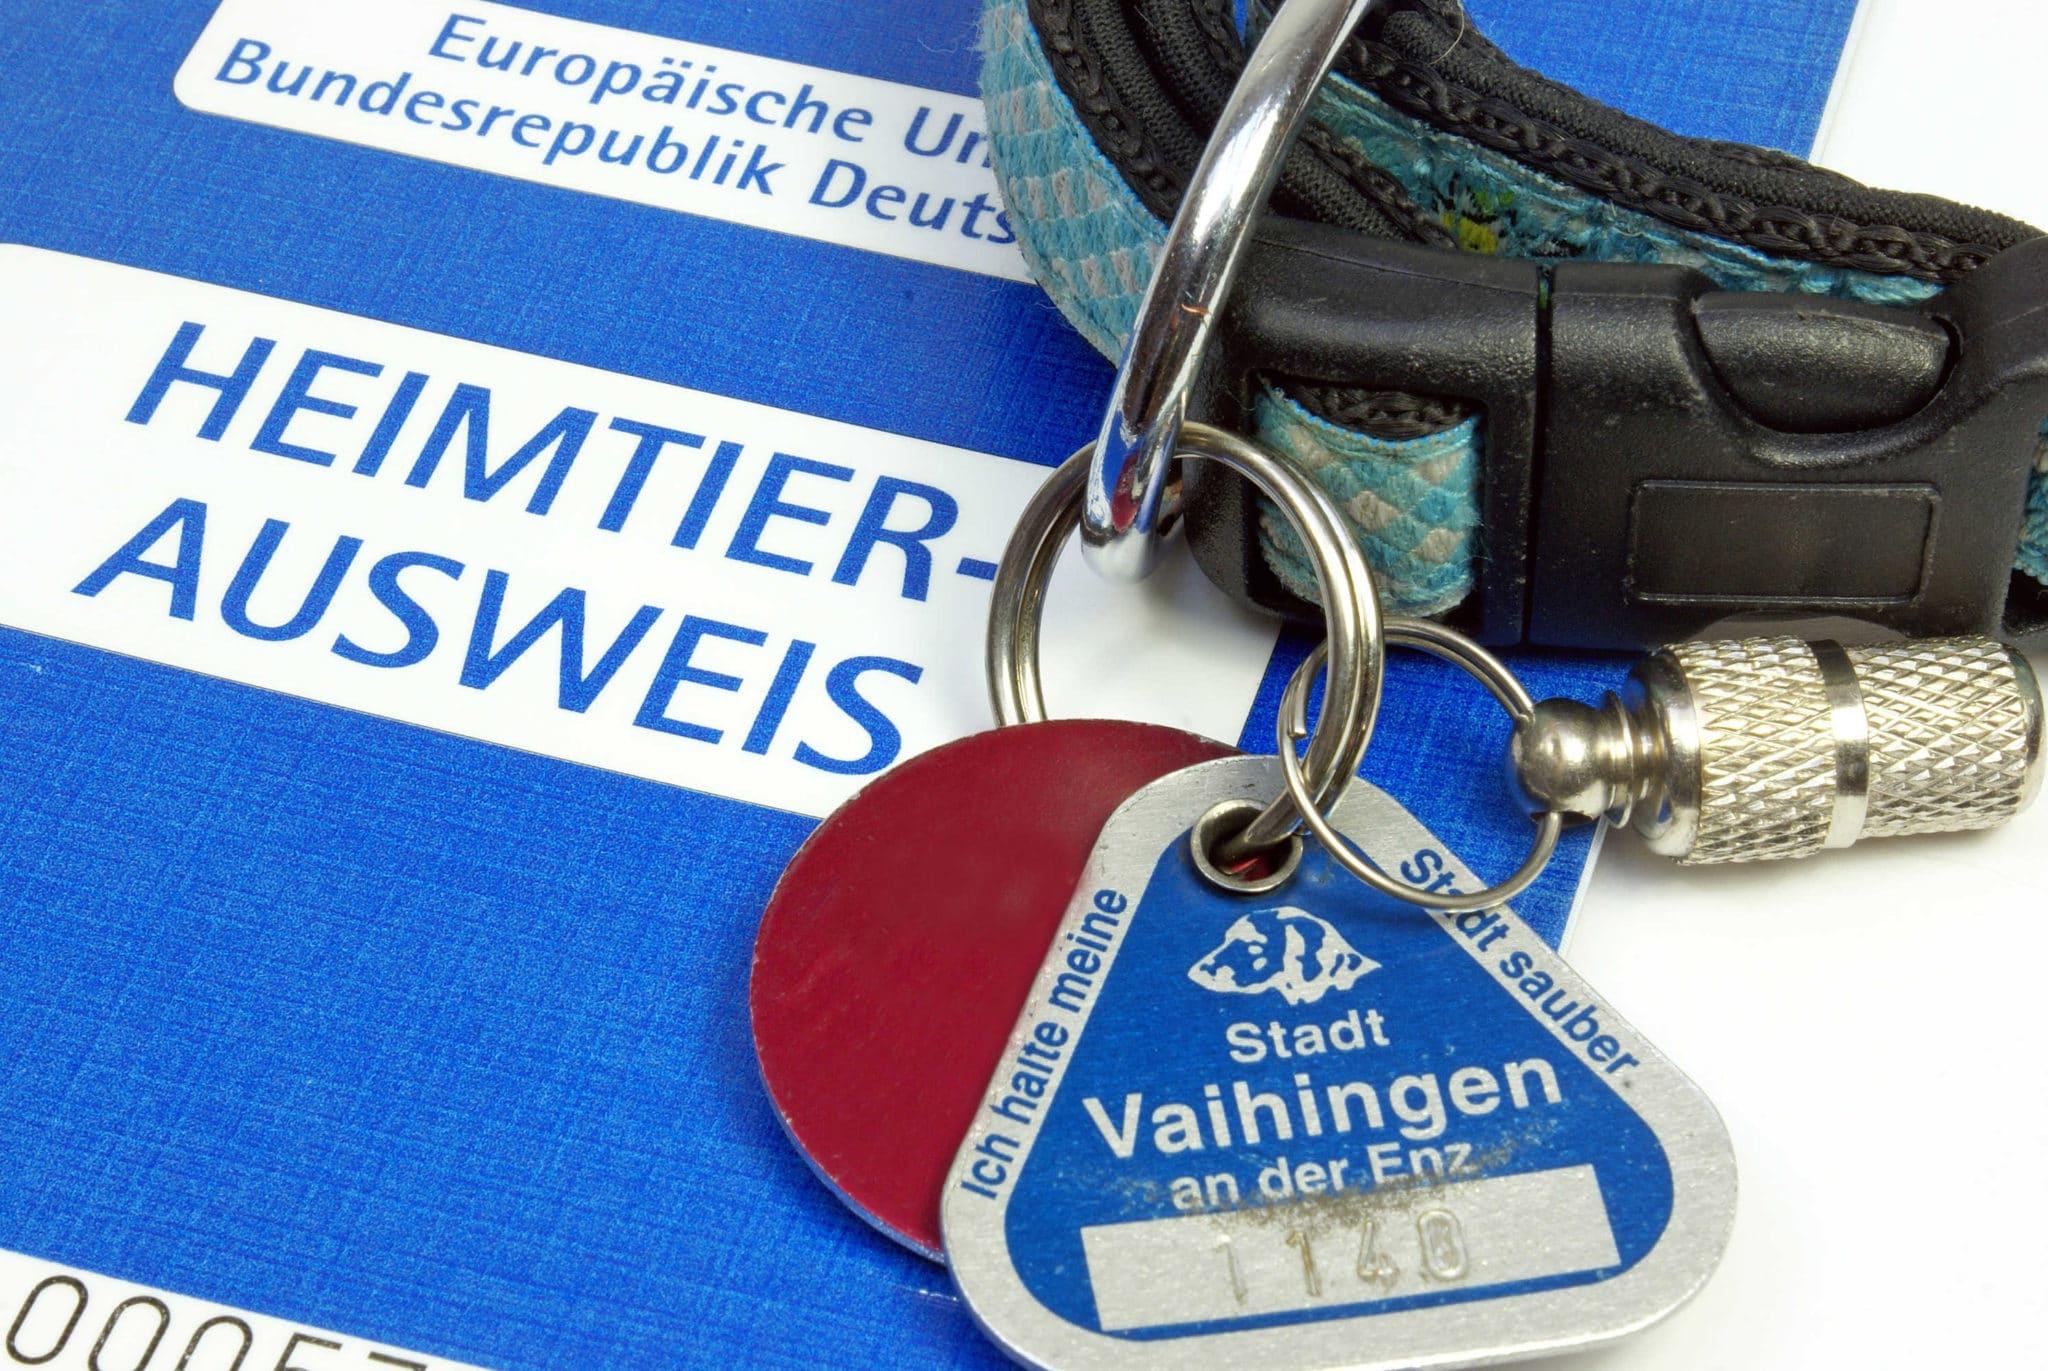 EU-Heimtierausweis für die Reise ins EU-Ausland.